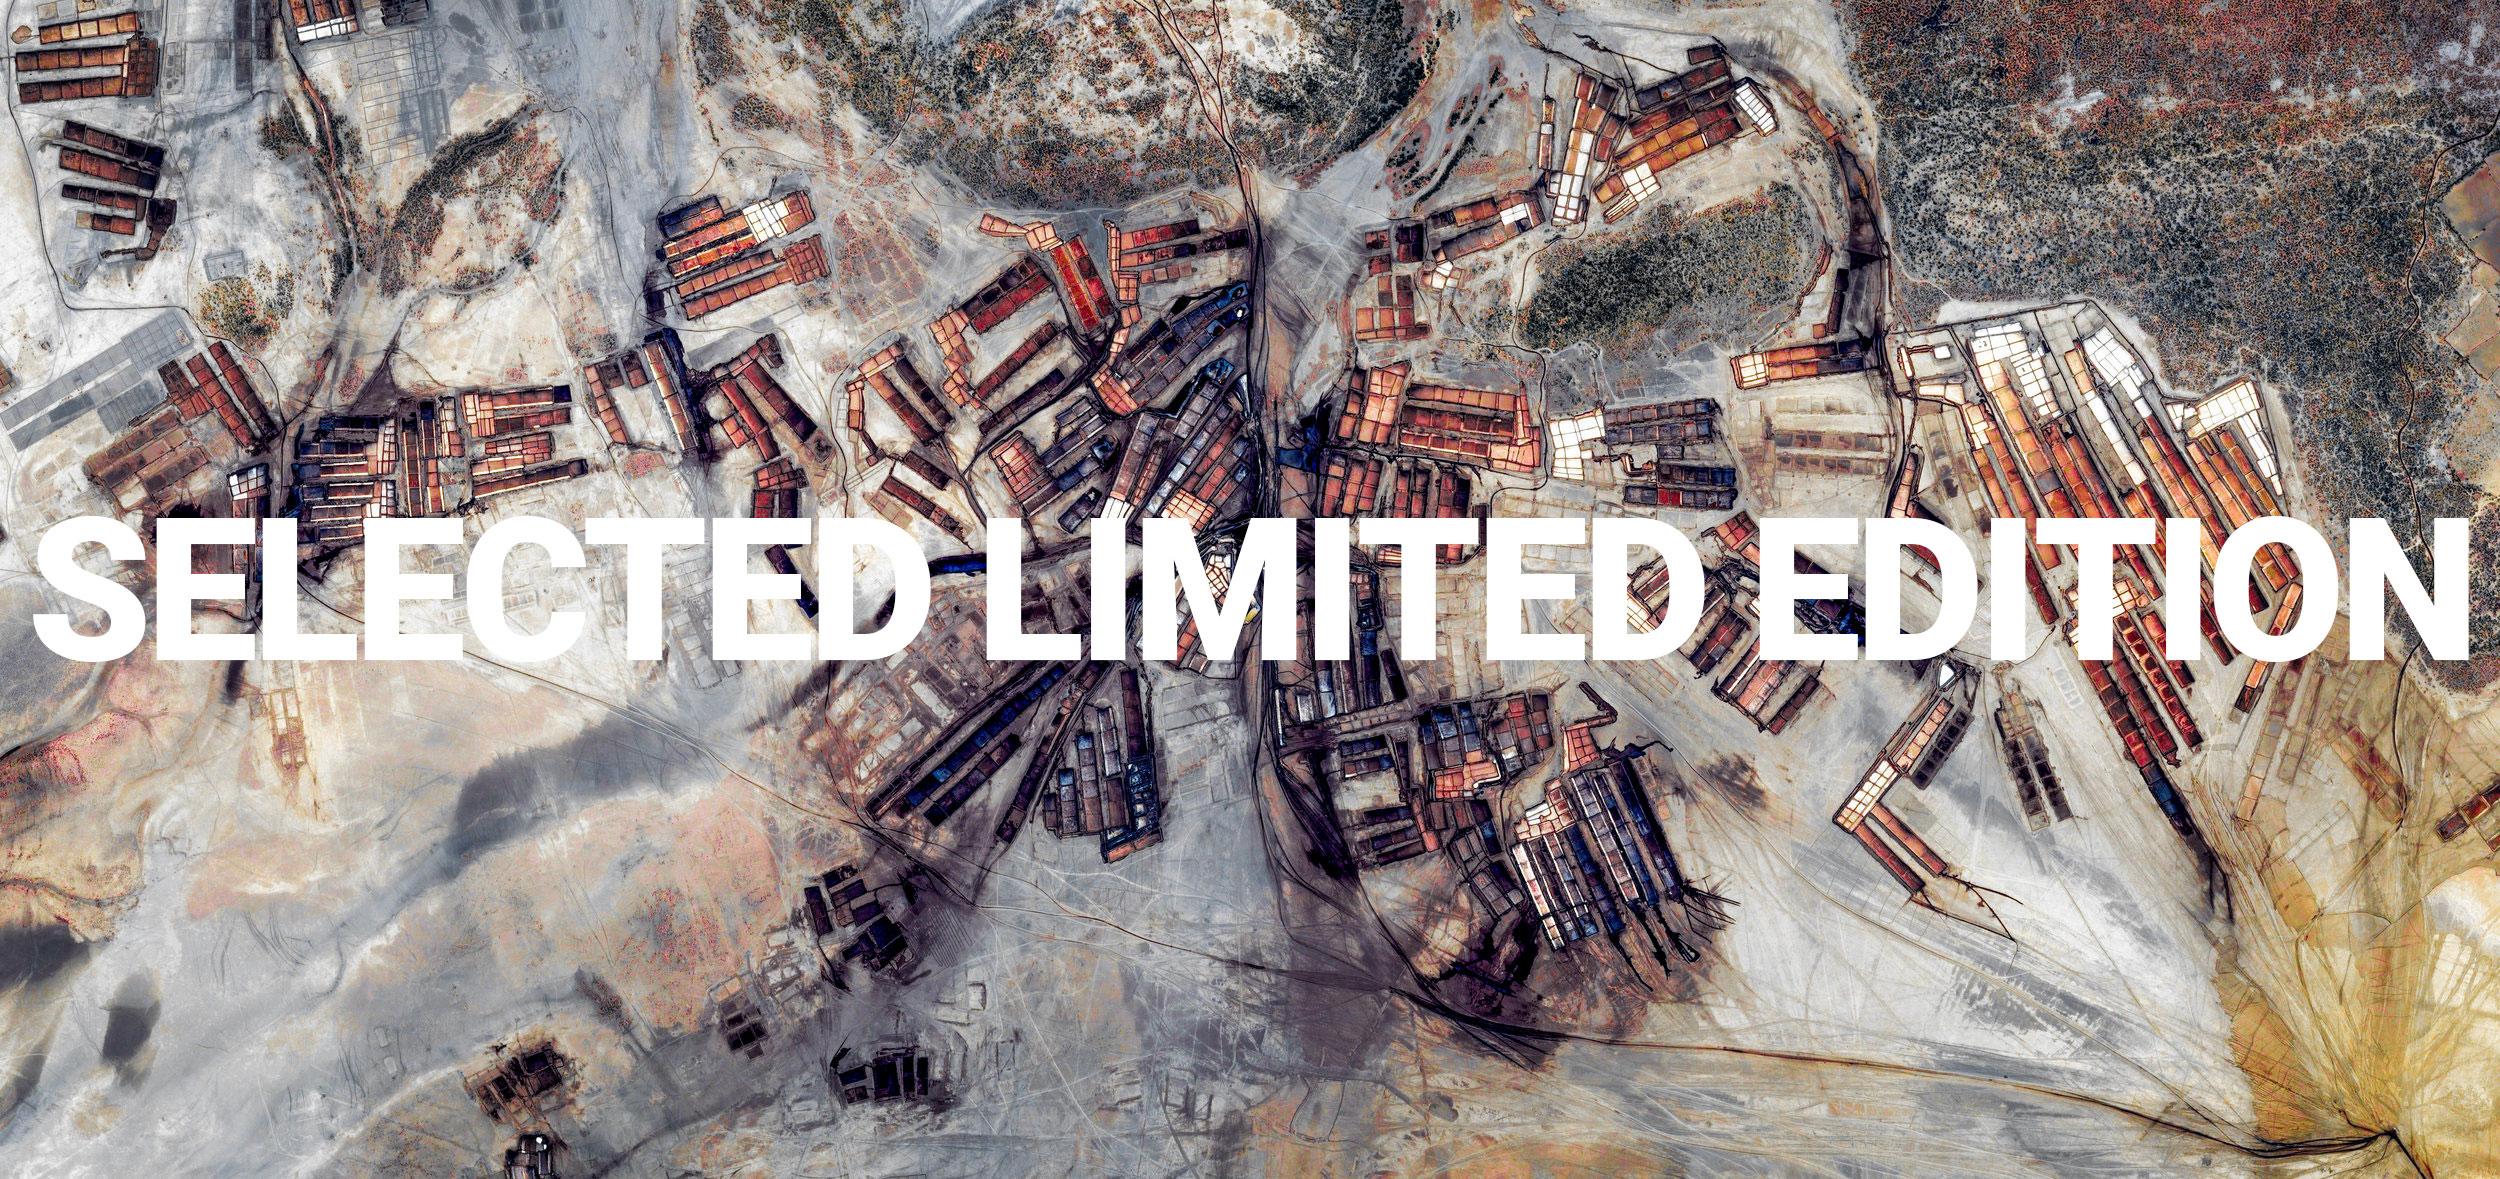 SELECTED-Antarnes-II-ULTRADISTANCIA-©Federico-Winer.jpg